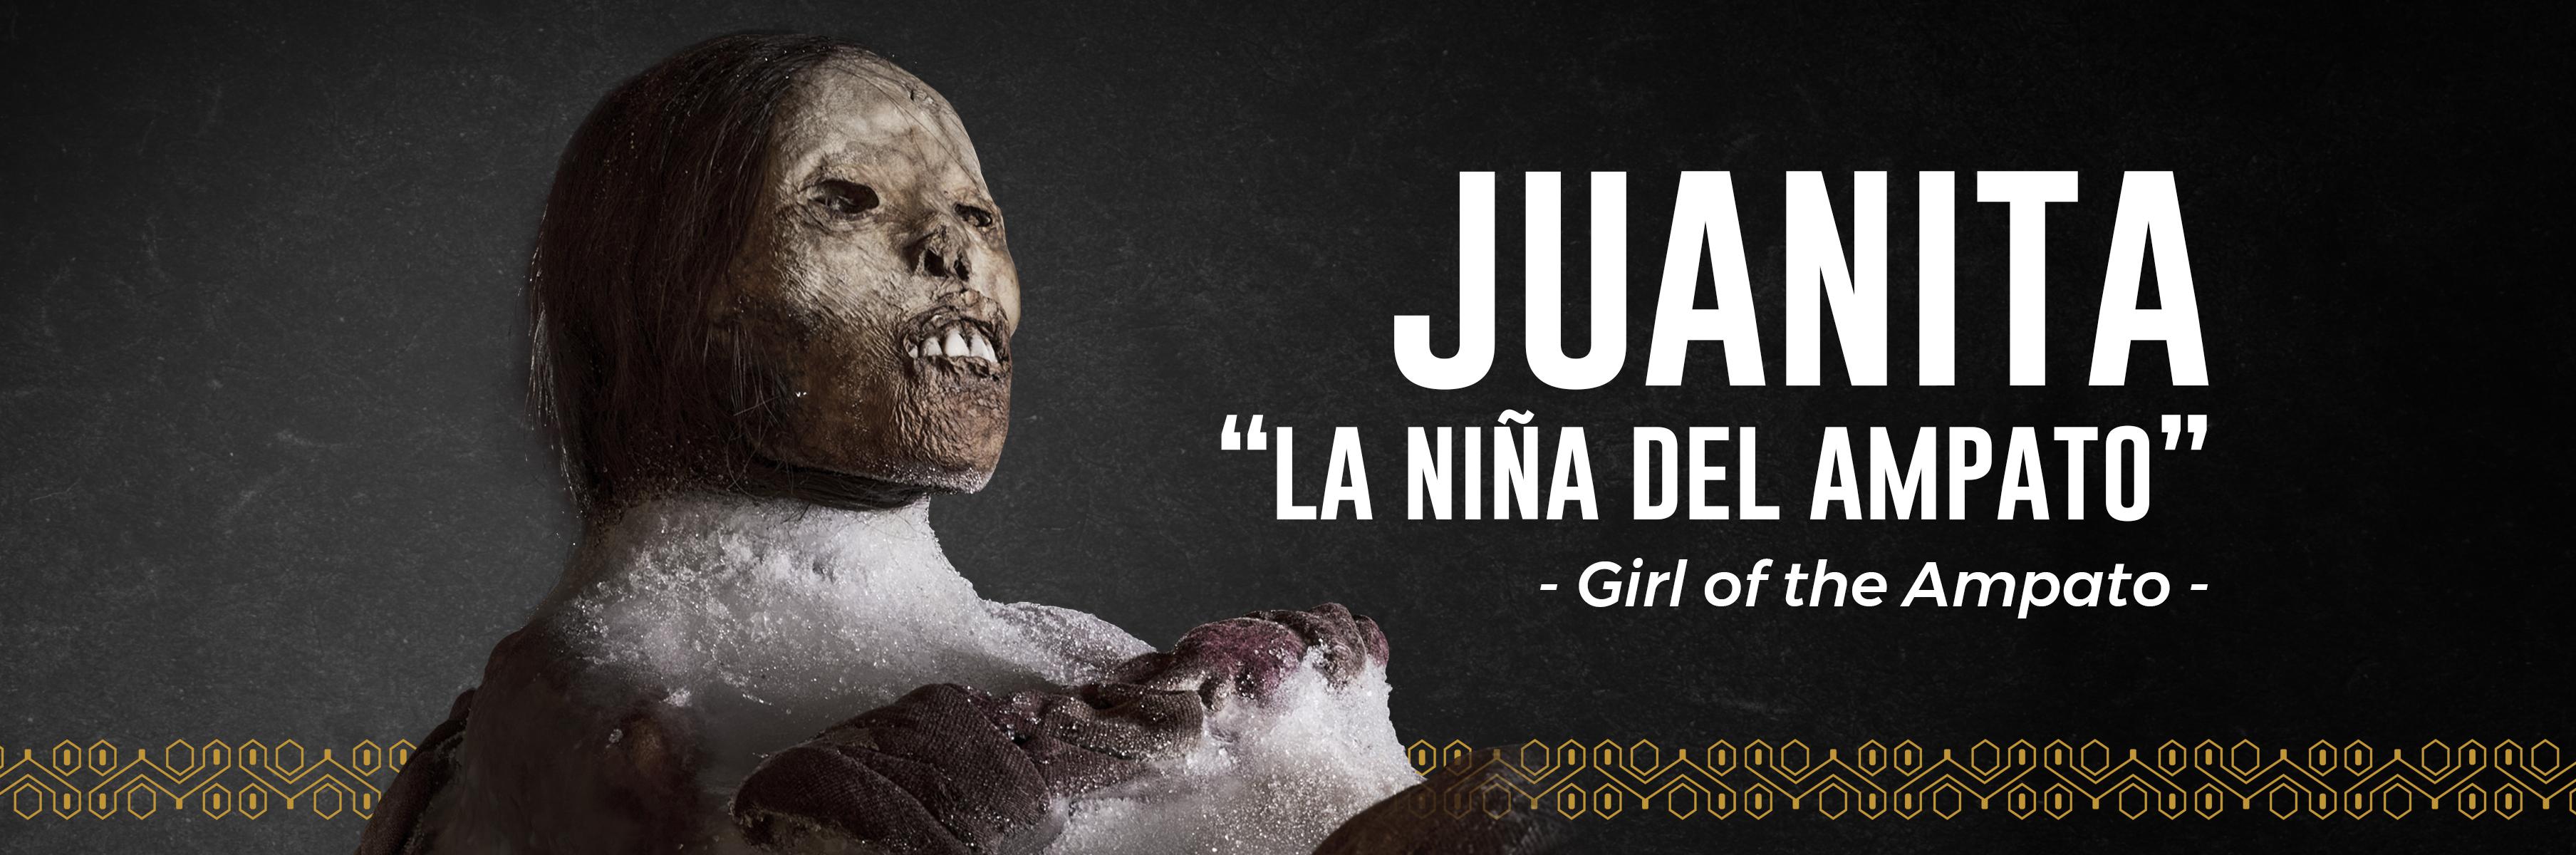 momia-juanita